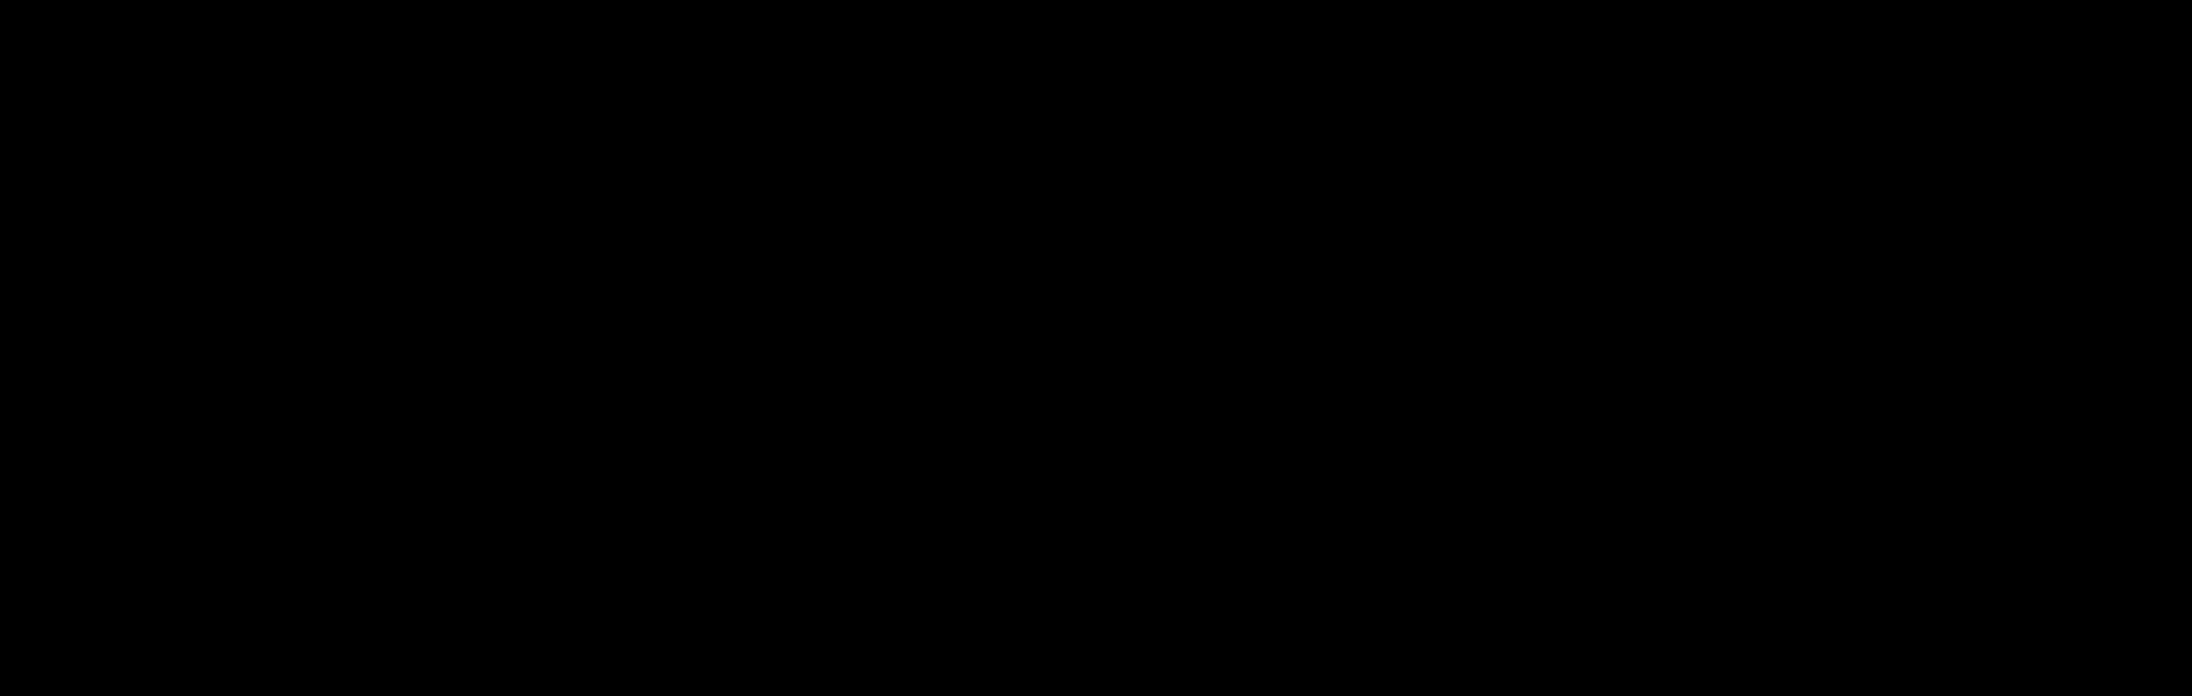 Homocapsaicin-II-d<sub>3</sub>